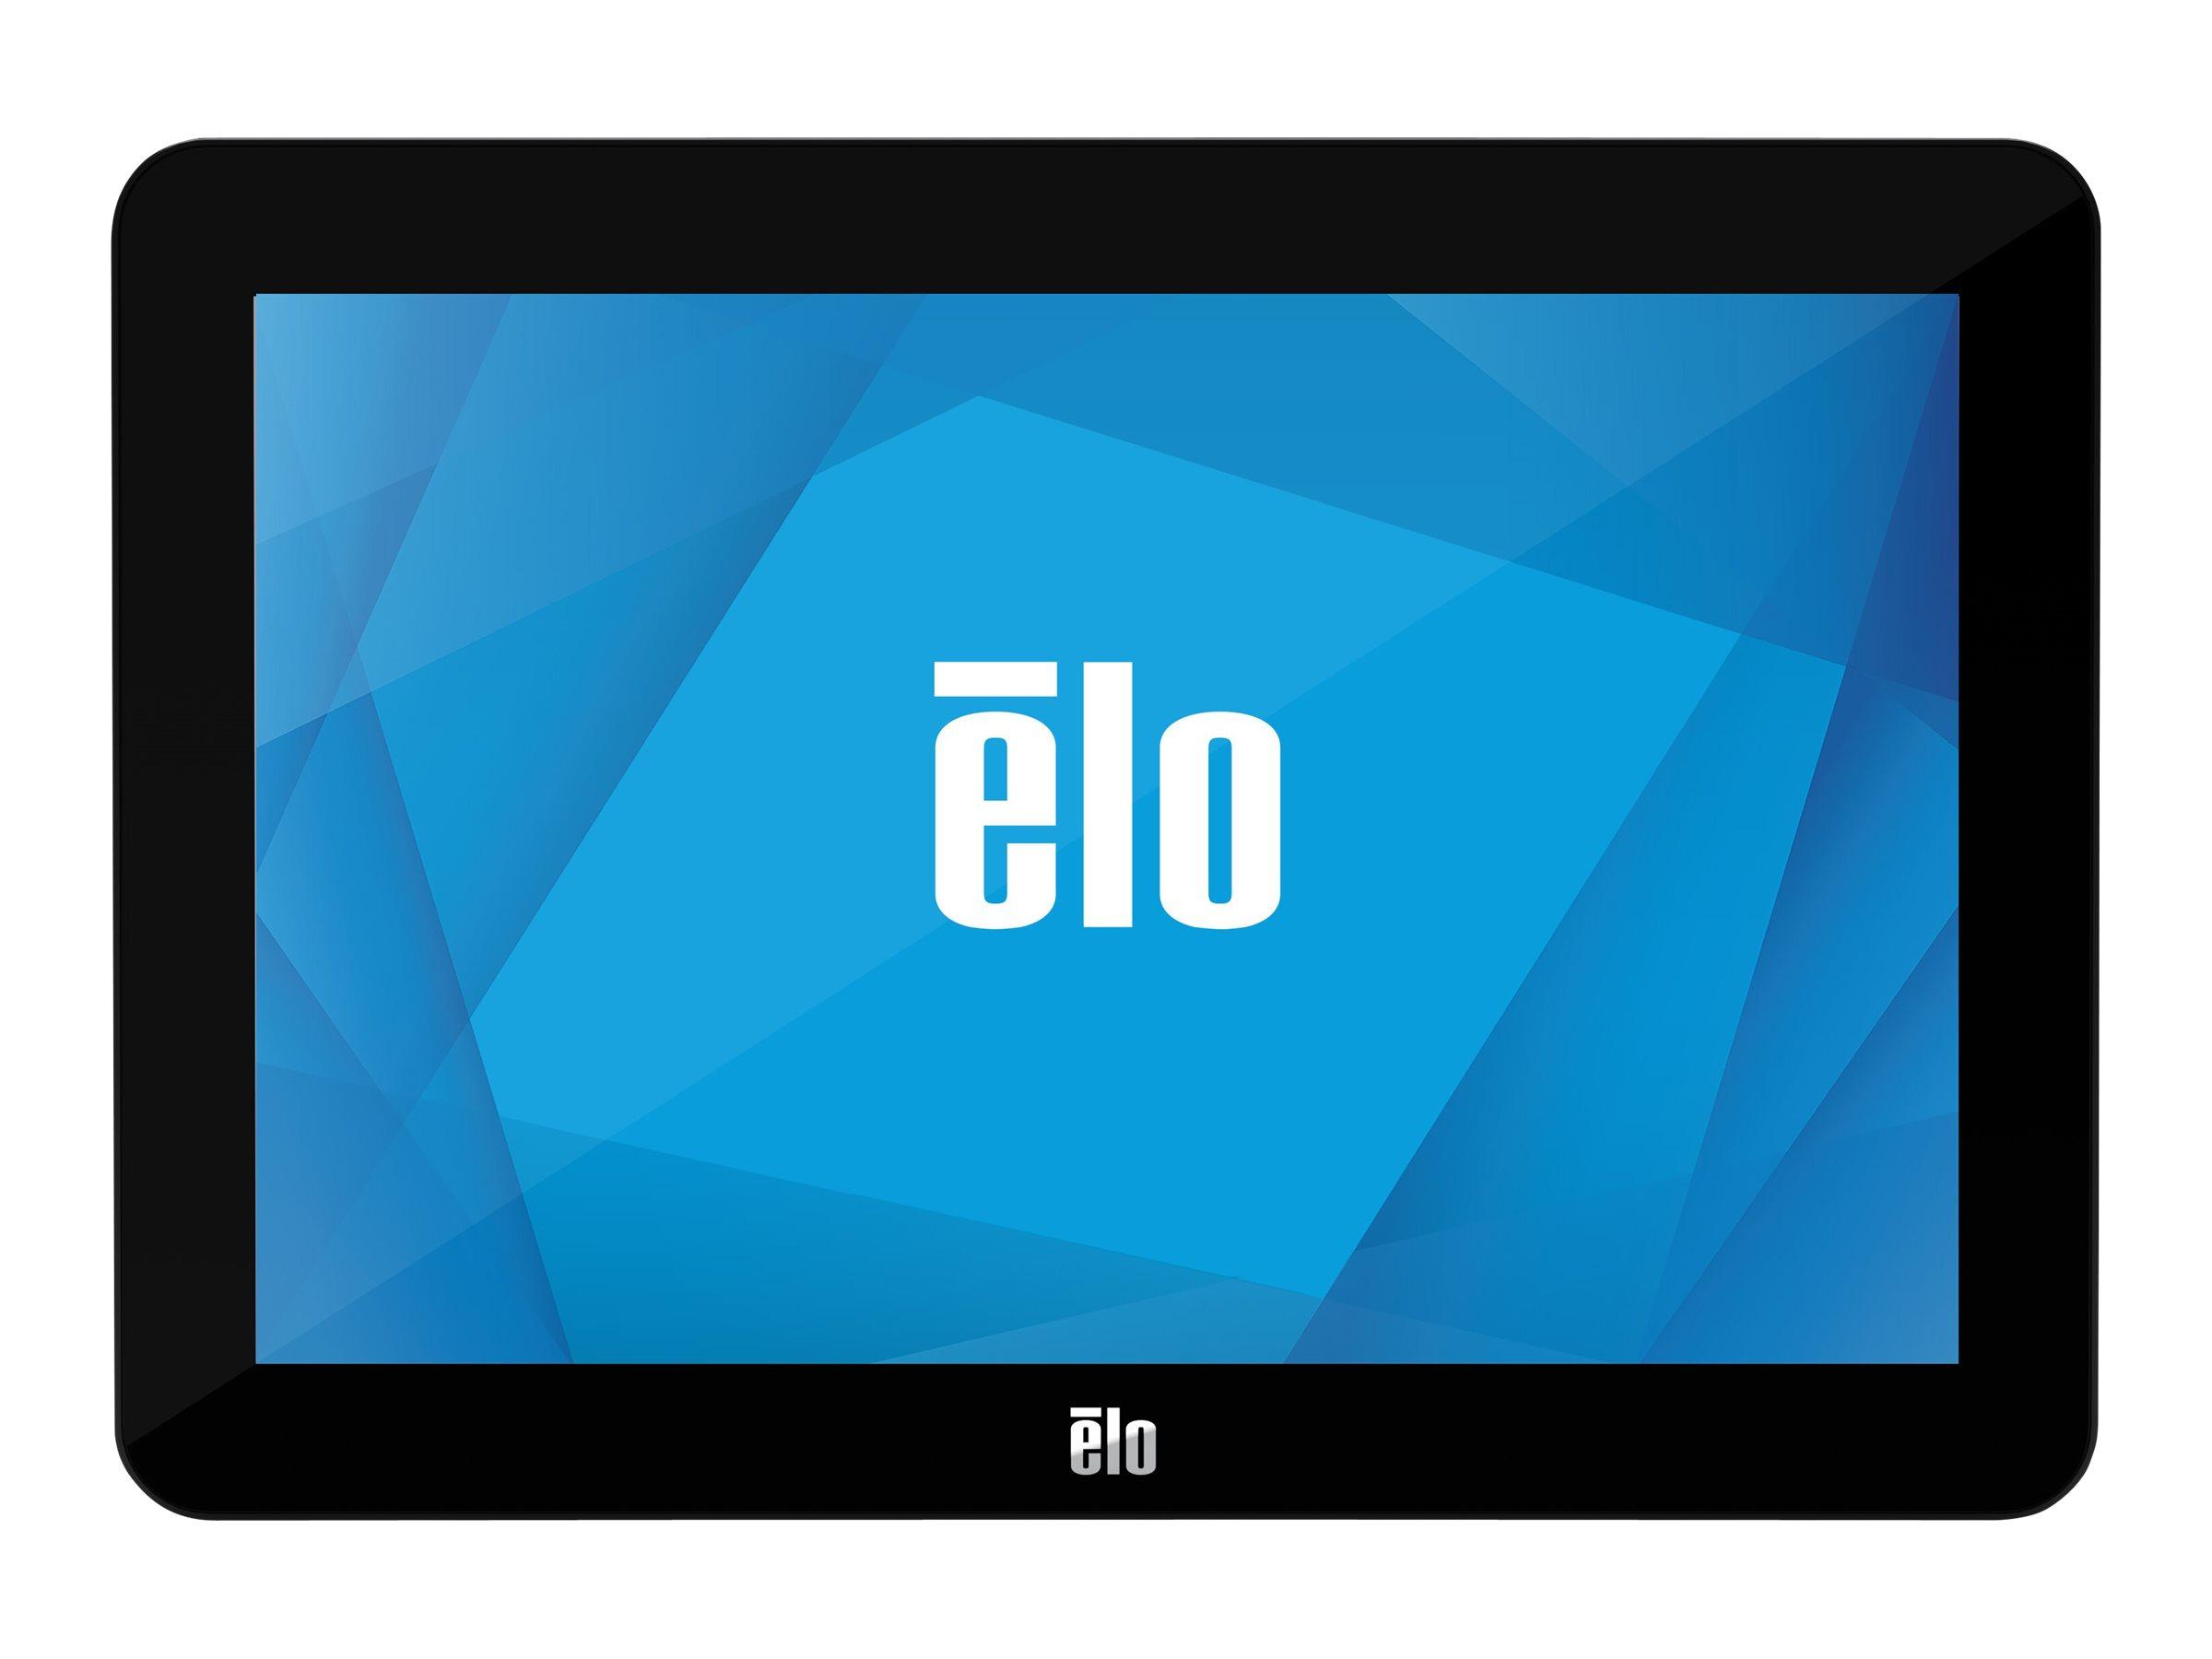 Elo 1002L - LED-Monitor - 25.654 cm (10.1